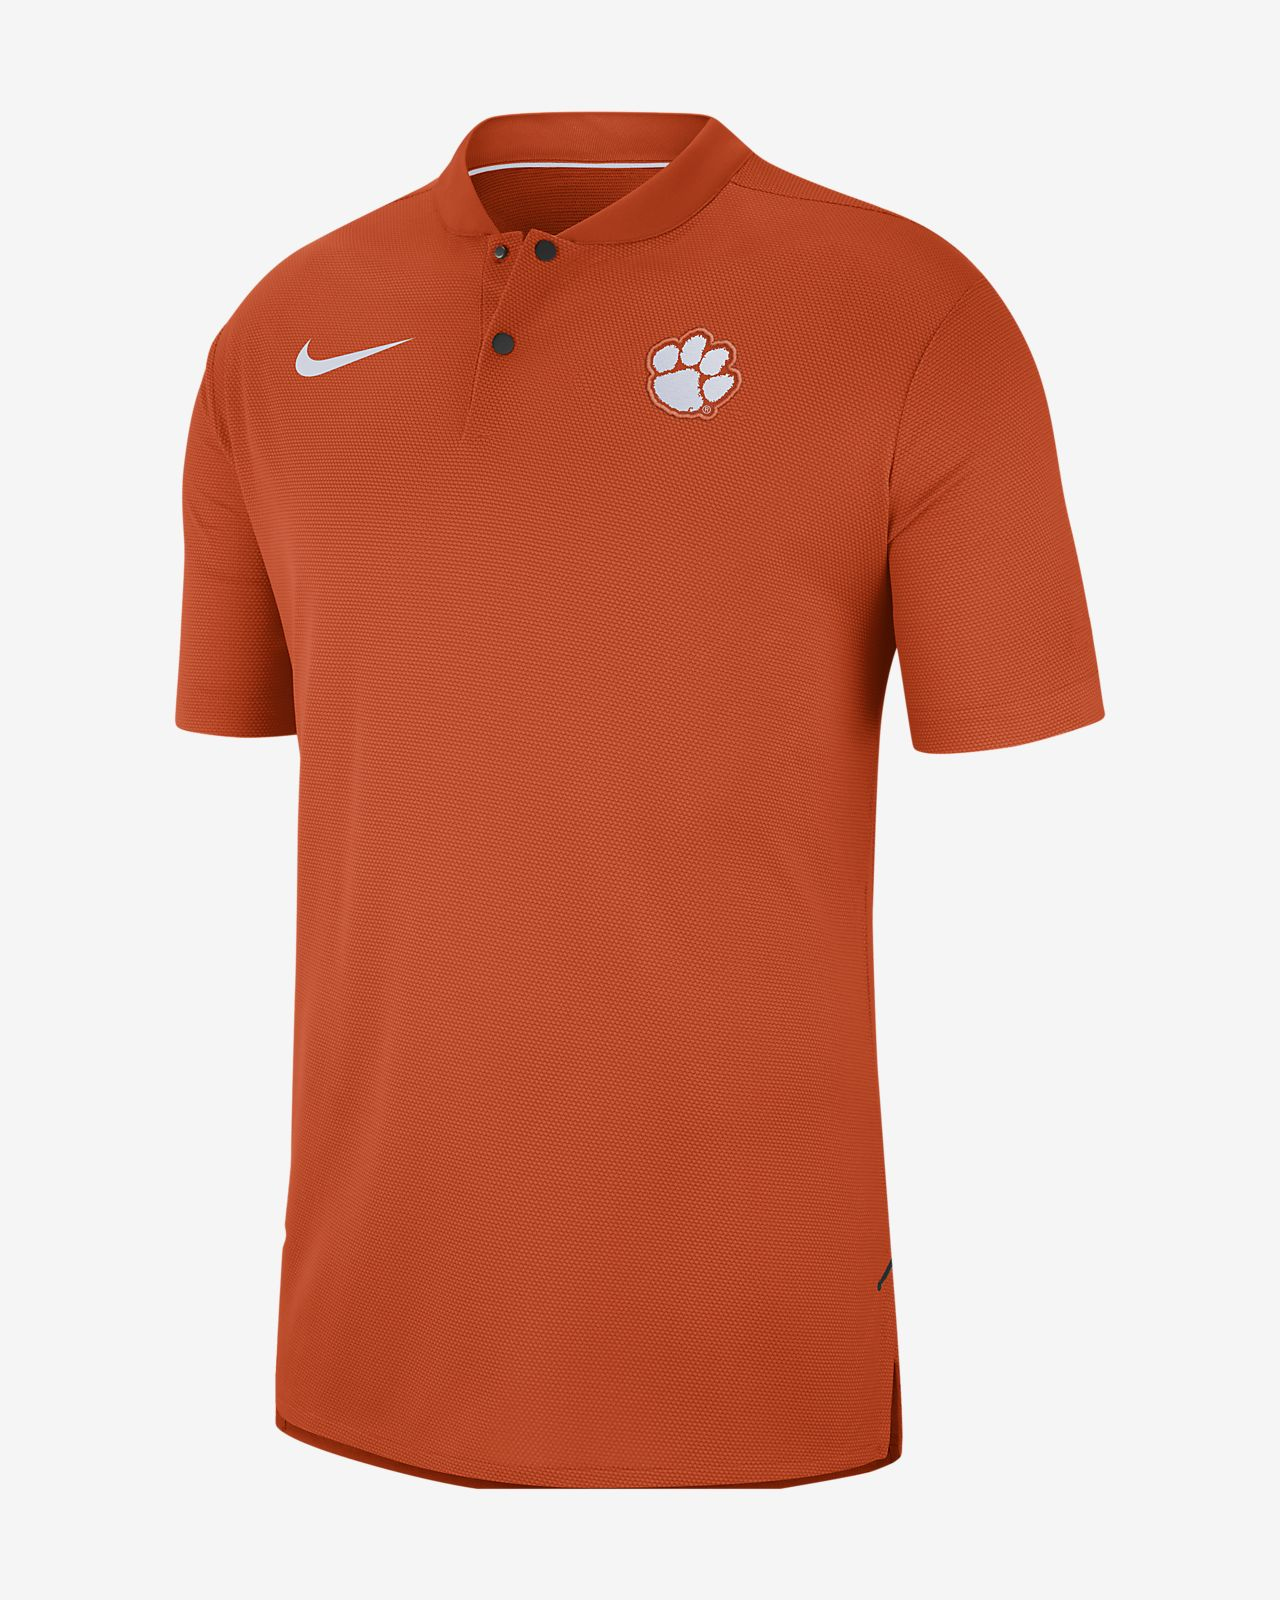 Nike College Dri Fit Elite Clemson Mens Polo Nike